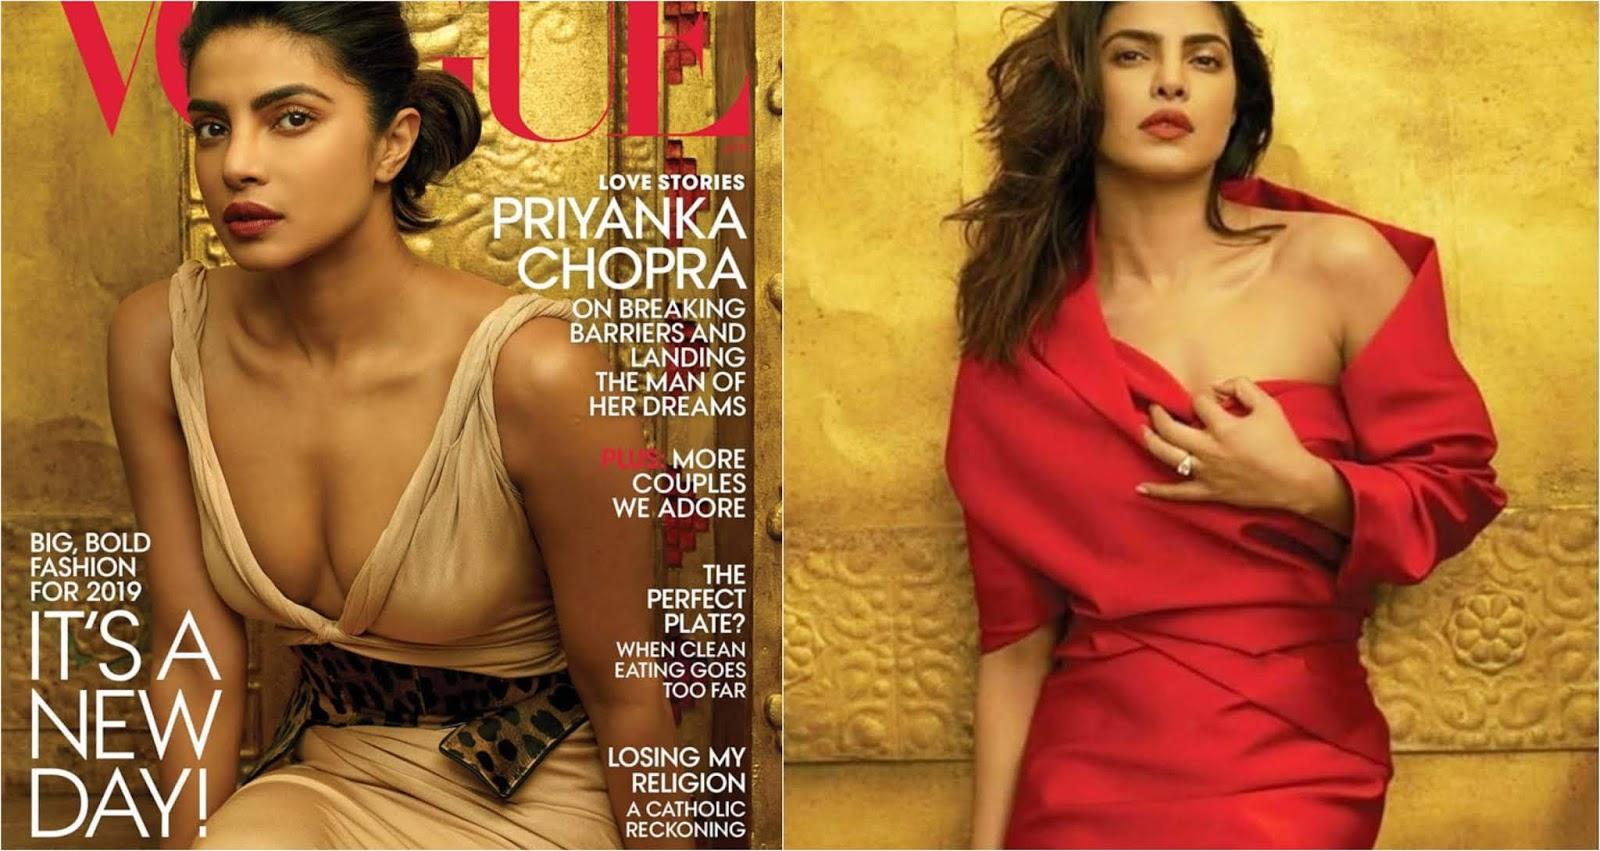 Priyanka Chopra Poses On The Latest Cover Page Of Vogue Magazine!